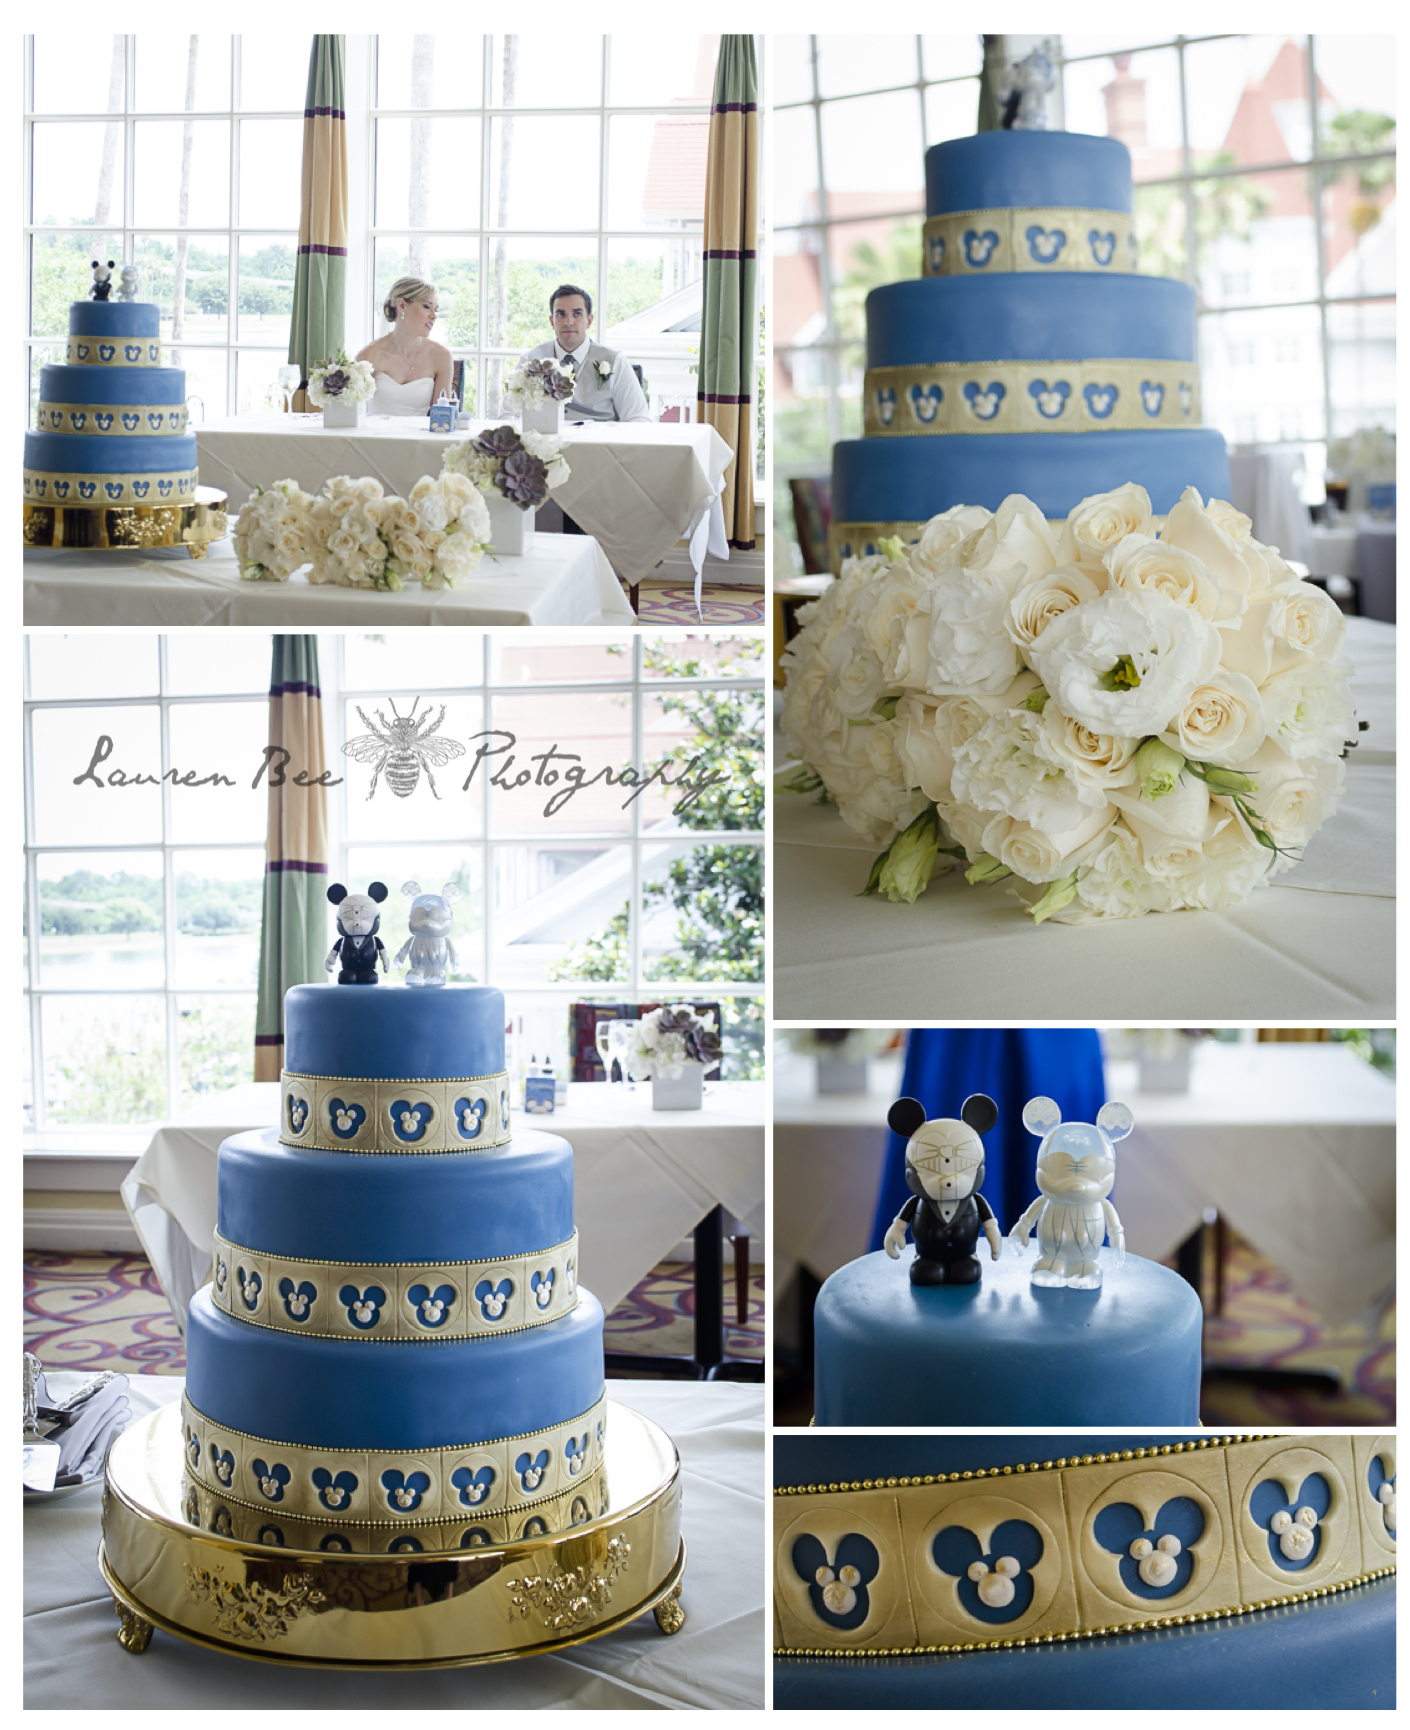 Disney World Citricos wedding cake